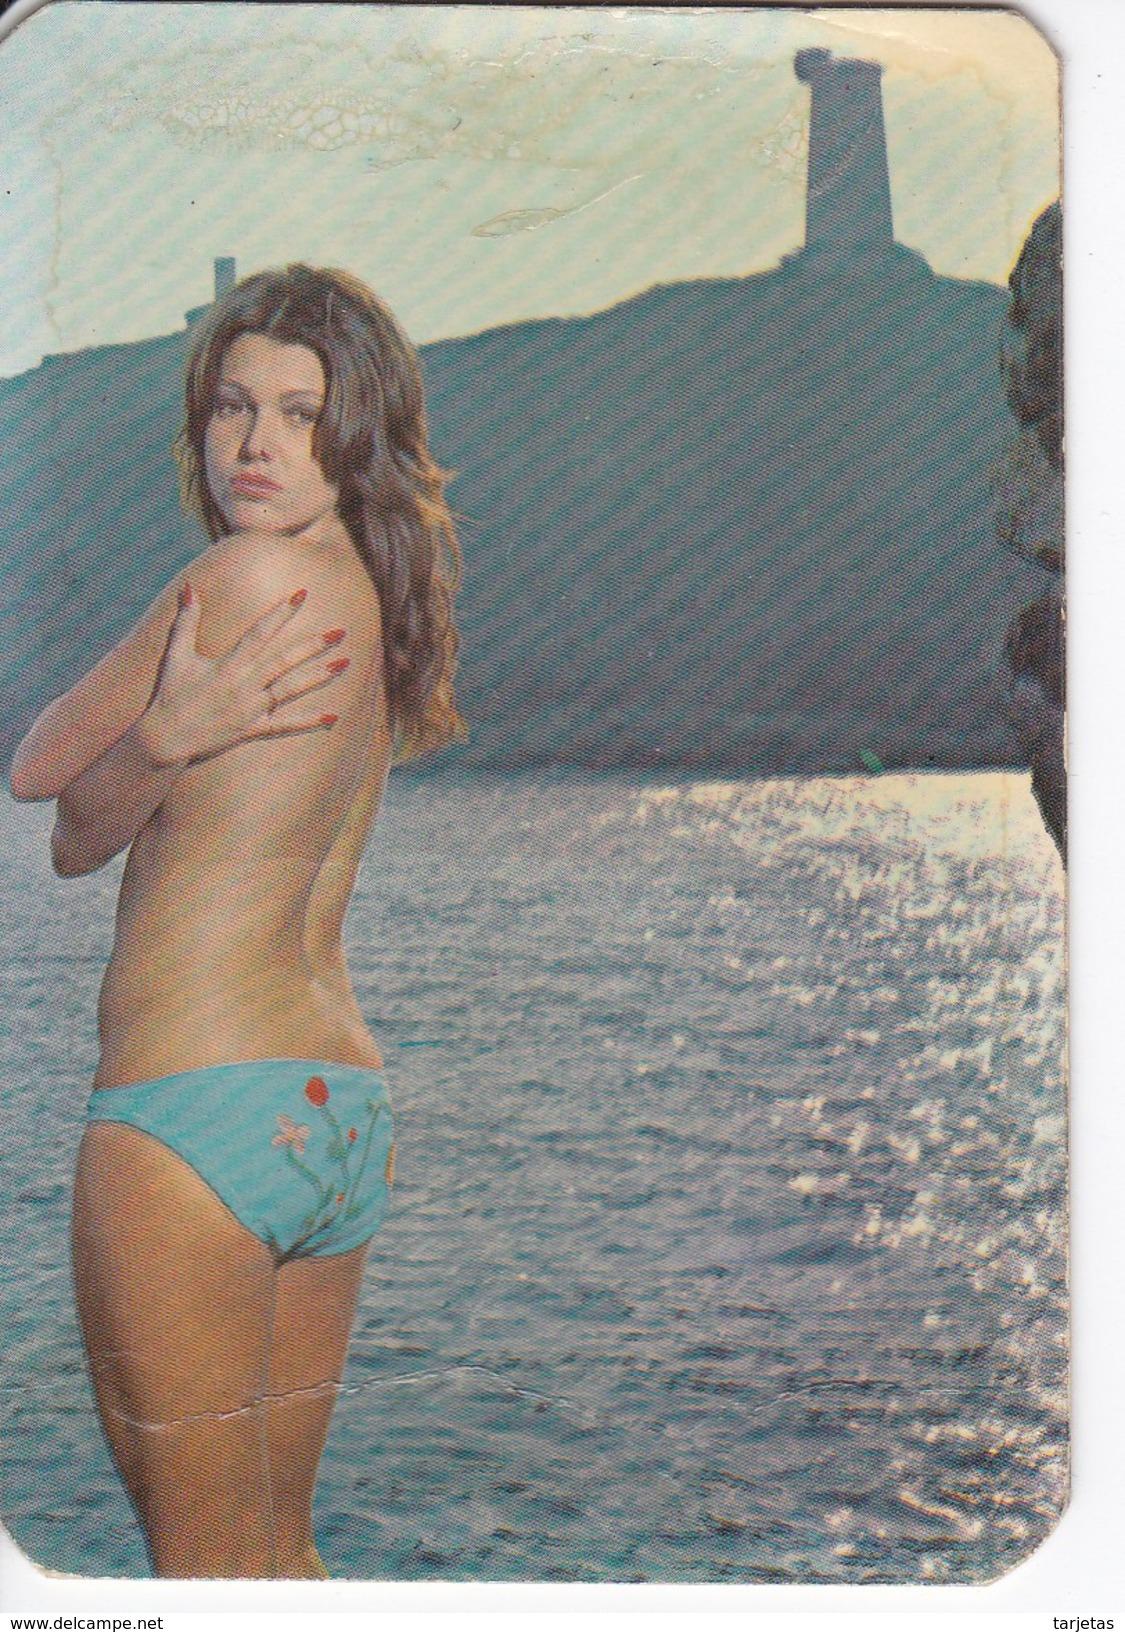 CALENDARIO DEL AÑO 1974 DE UNA CHICA SEXI (NUDE-DESNUDO) (CALENDRIER-CALENDAR) - Calendarios